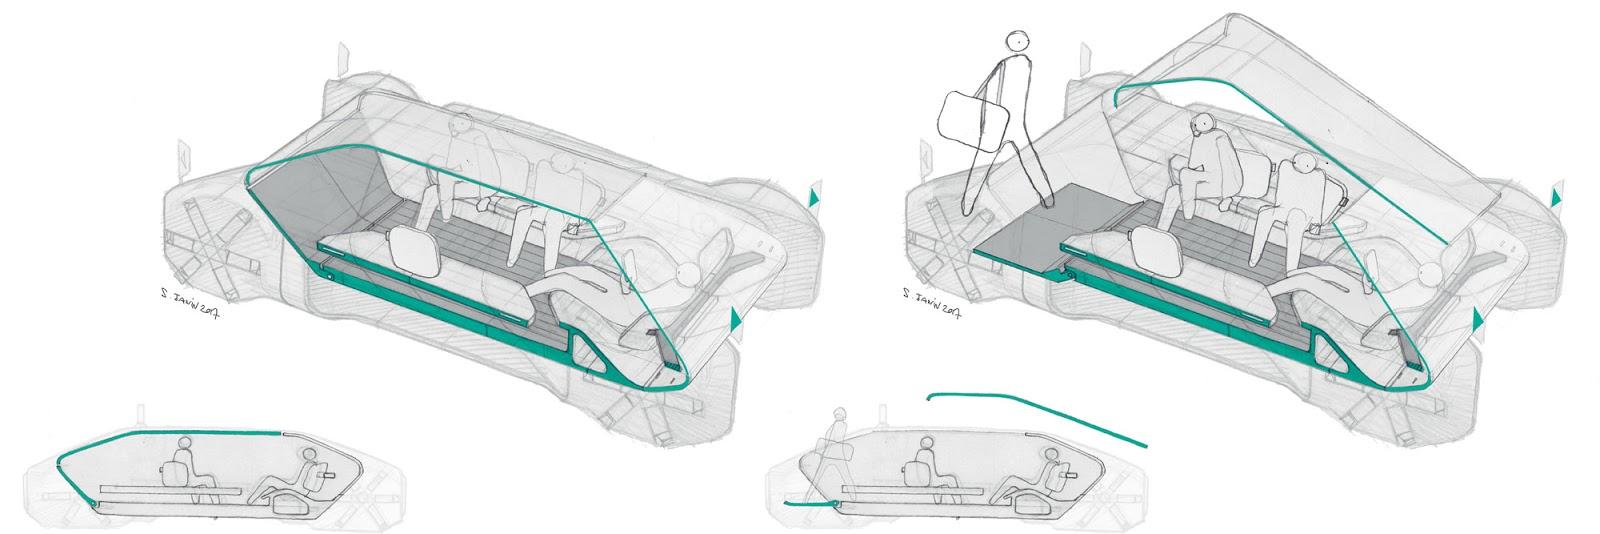 Renault EZ-GO Concept sketch by Stephane Janine